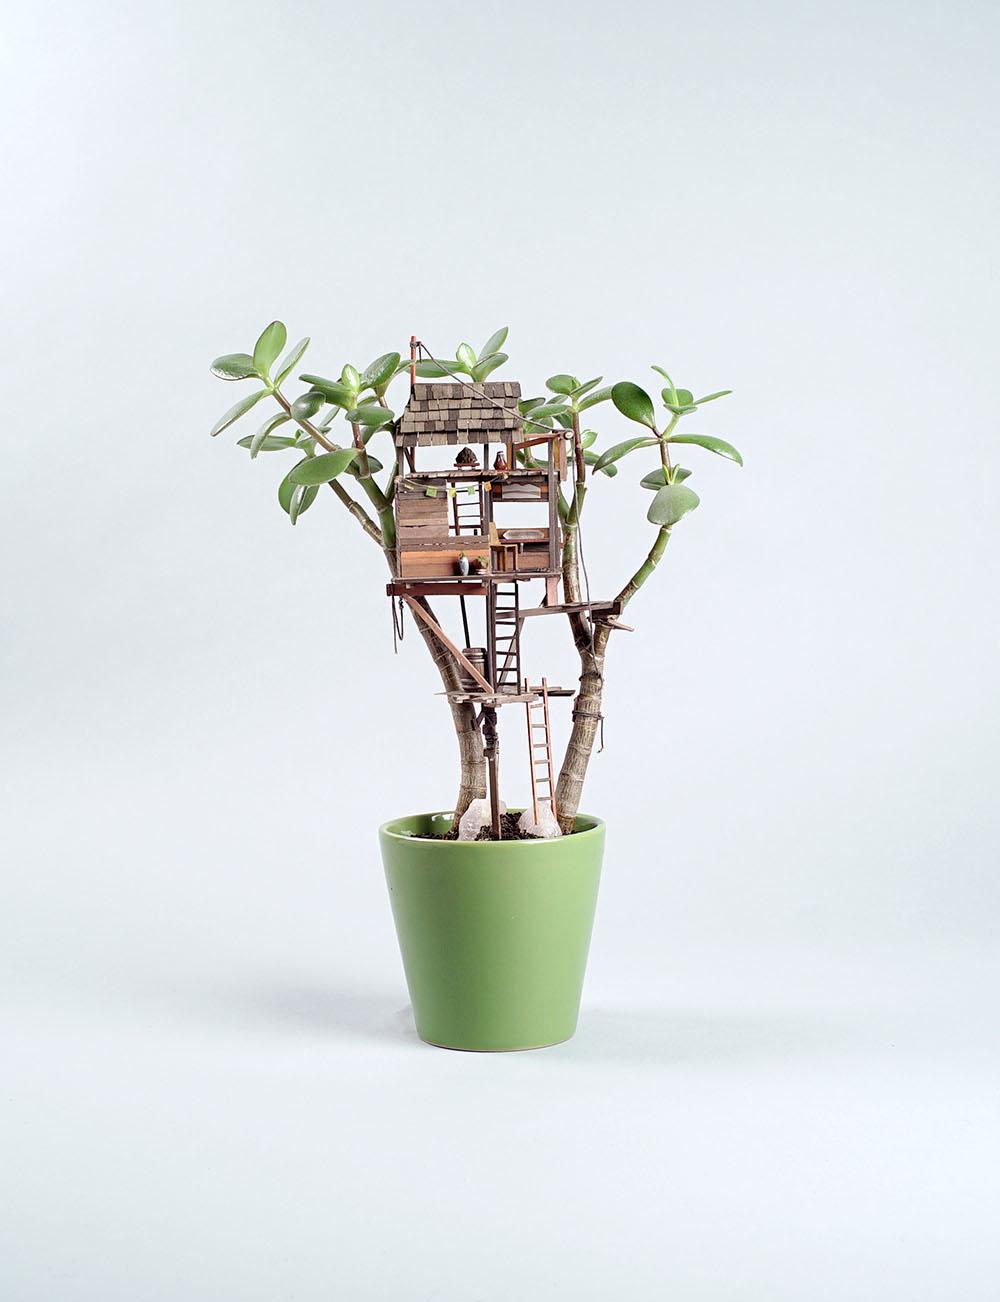 Miniature Sculptures Plant Decor on Succulent in Round Green Pot Jedediah Voltz Art